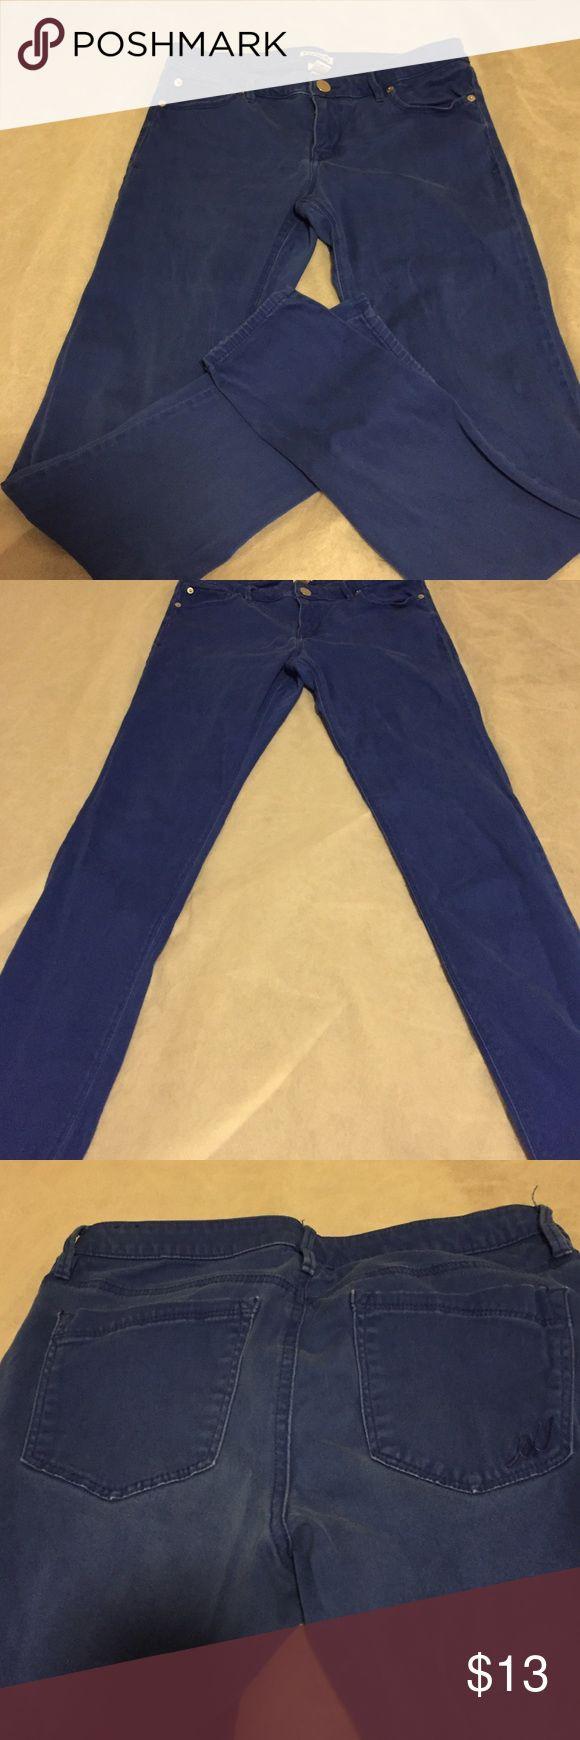 Express, electric blue jean leggings Express, electric blue, Jean legging. Soft extreme stretch material. Natural fading from washing. Express Pants Leggings